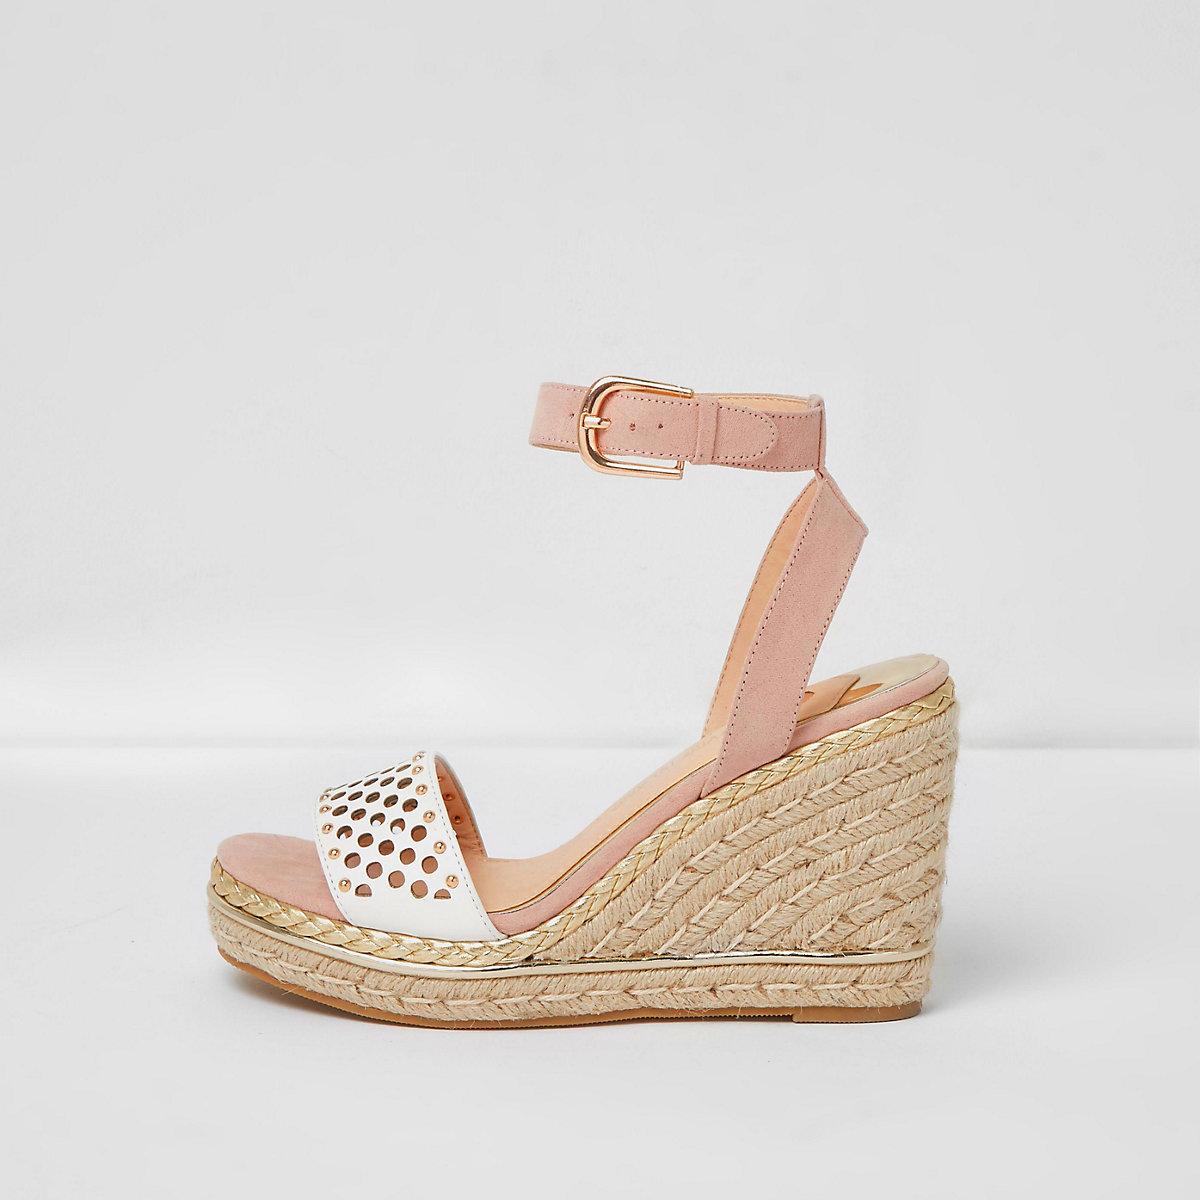 ca8e4501257 Pink wide fit laser cut espadrille wedges - Sandals - Shoes   Boots - women